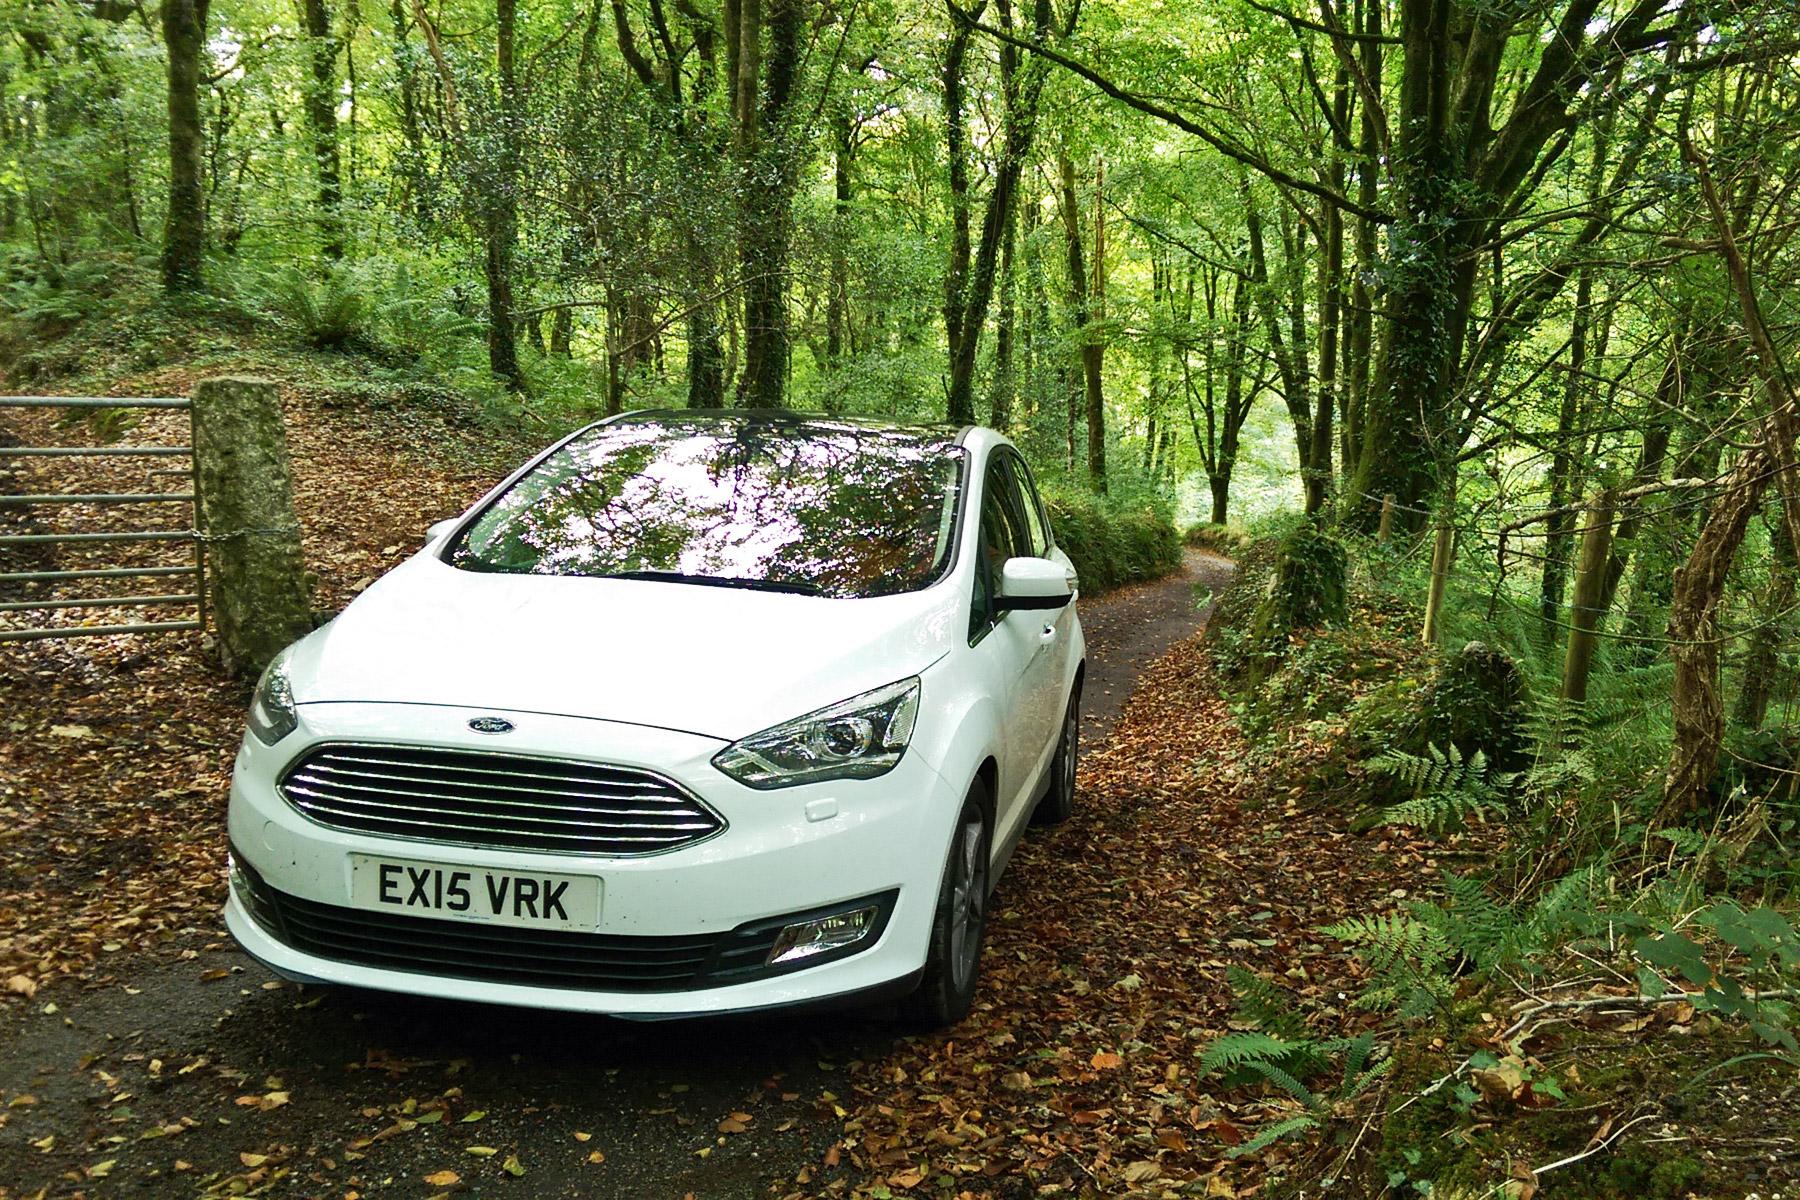 2015 Ford C-Max 1.5 TDCI Titanium X: a week in Cornwall